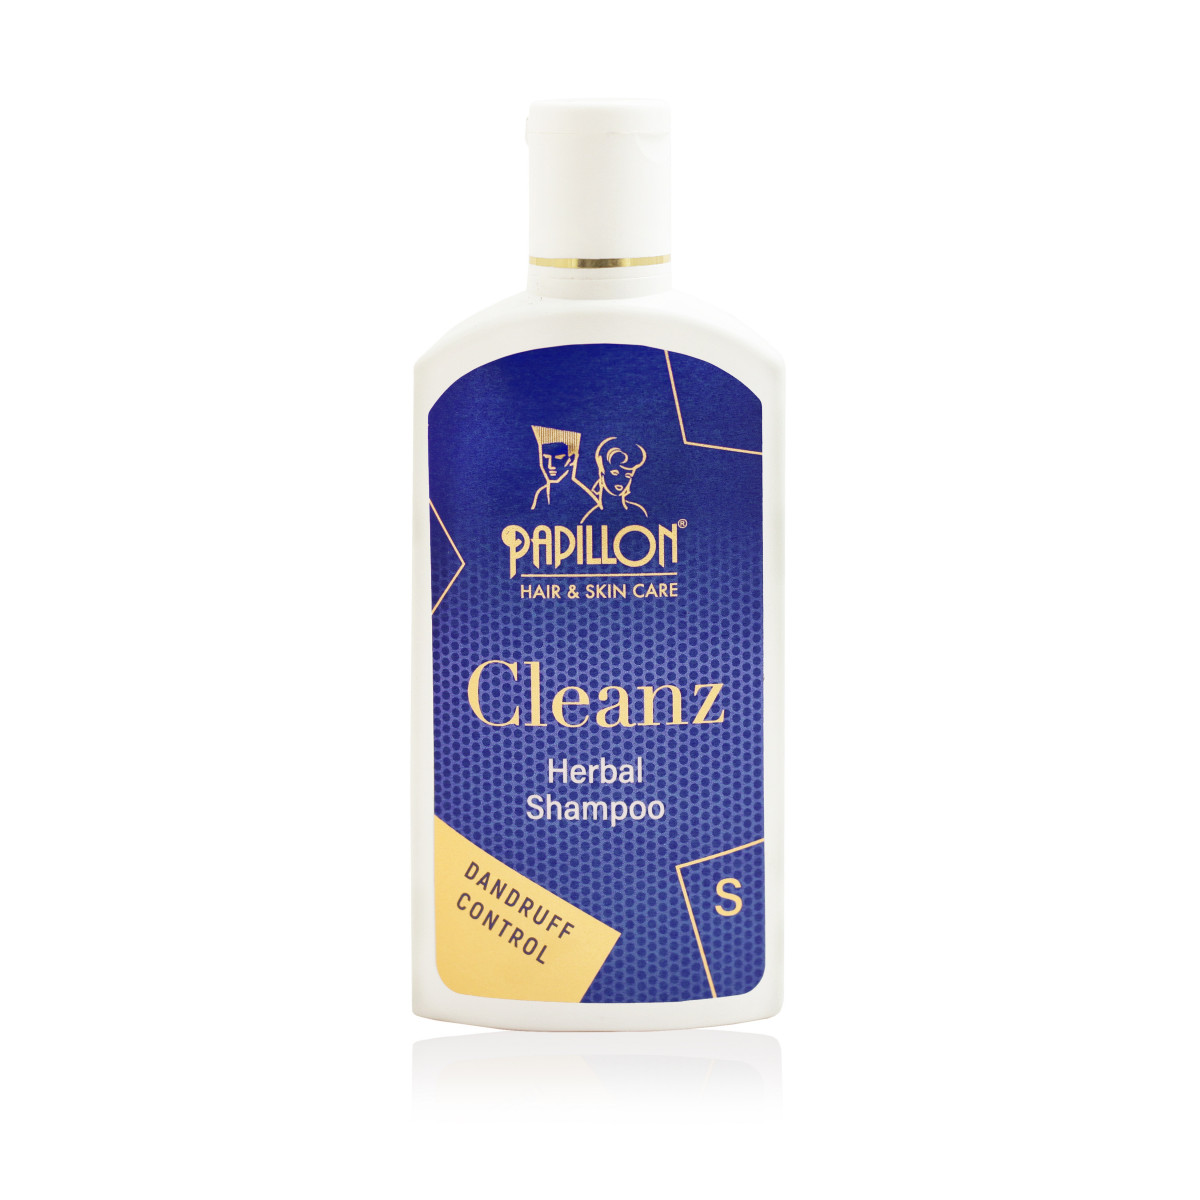 Cleanz Dandruff Control Kit